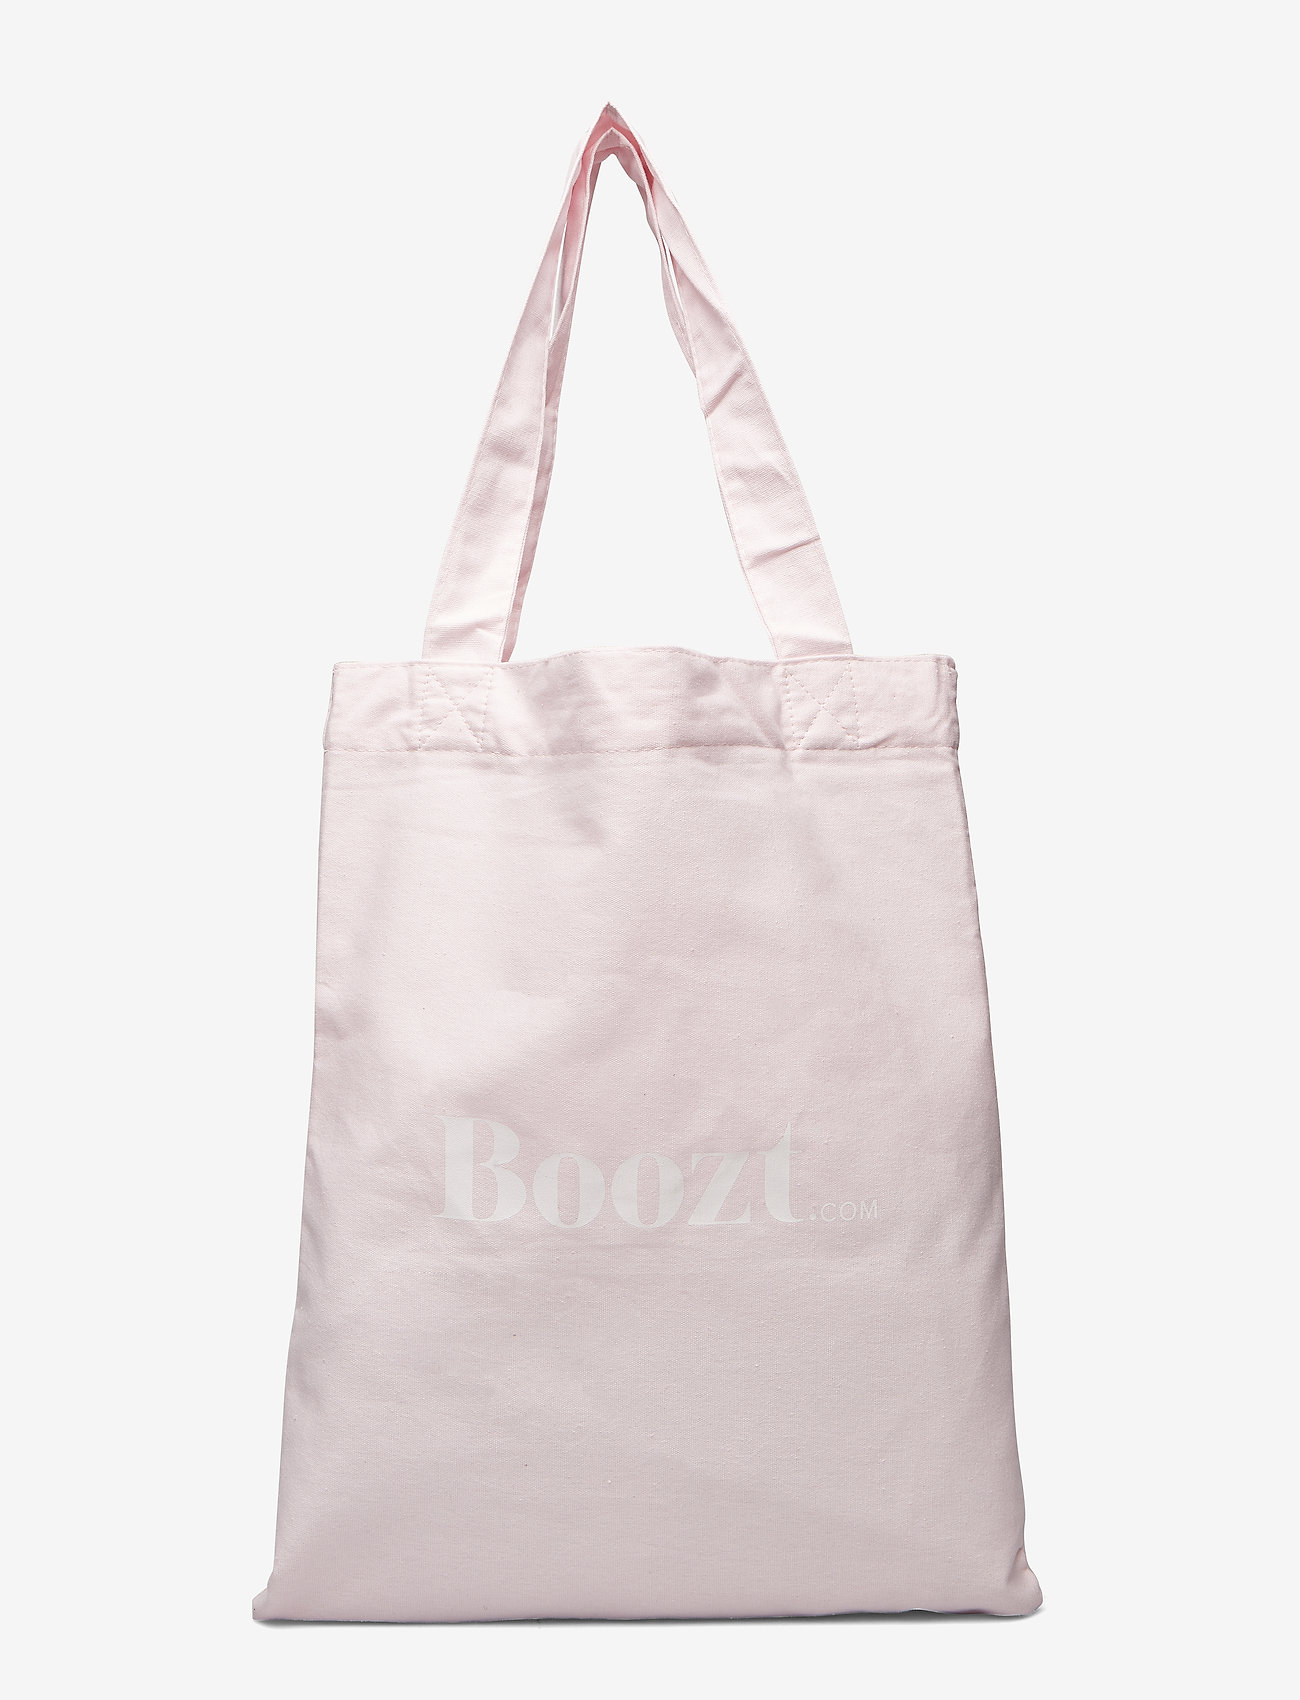 Boozt Merchandise - Boozt totebag - shoulder bags - lt pink - 0